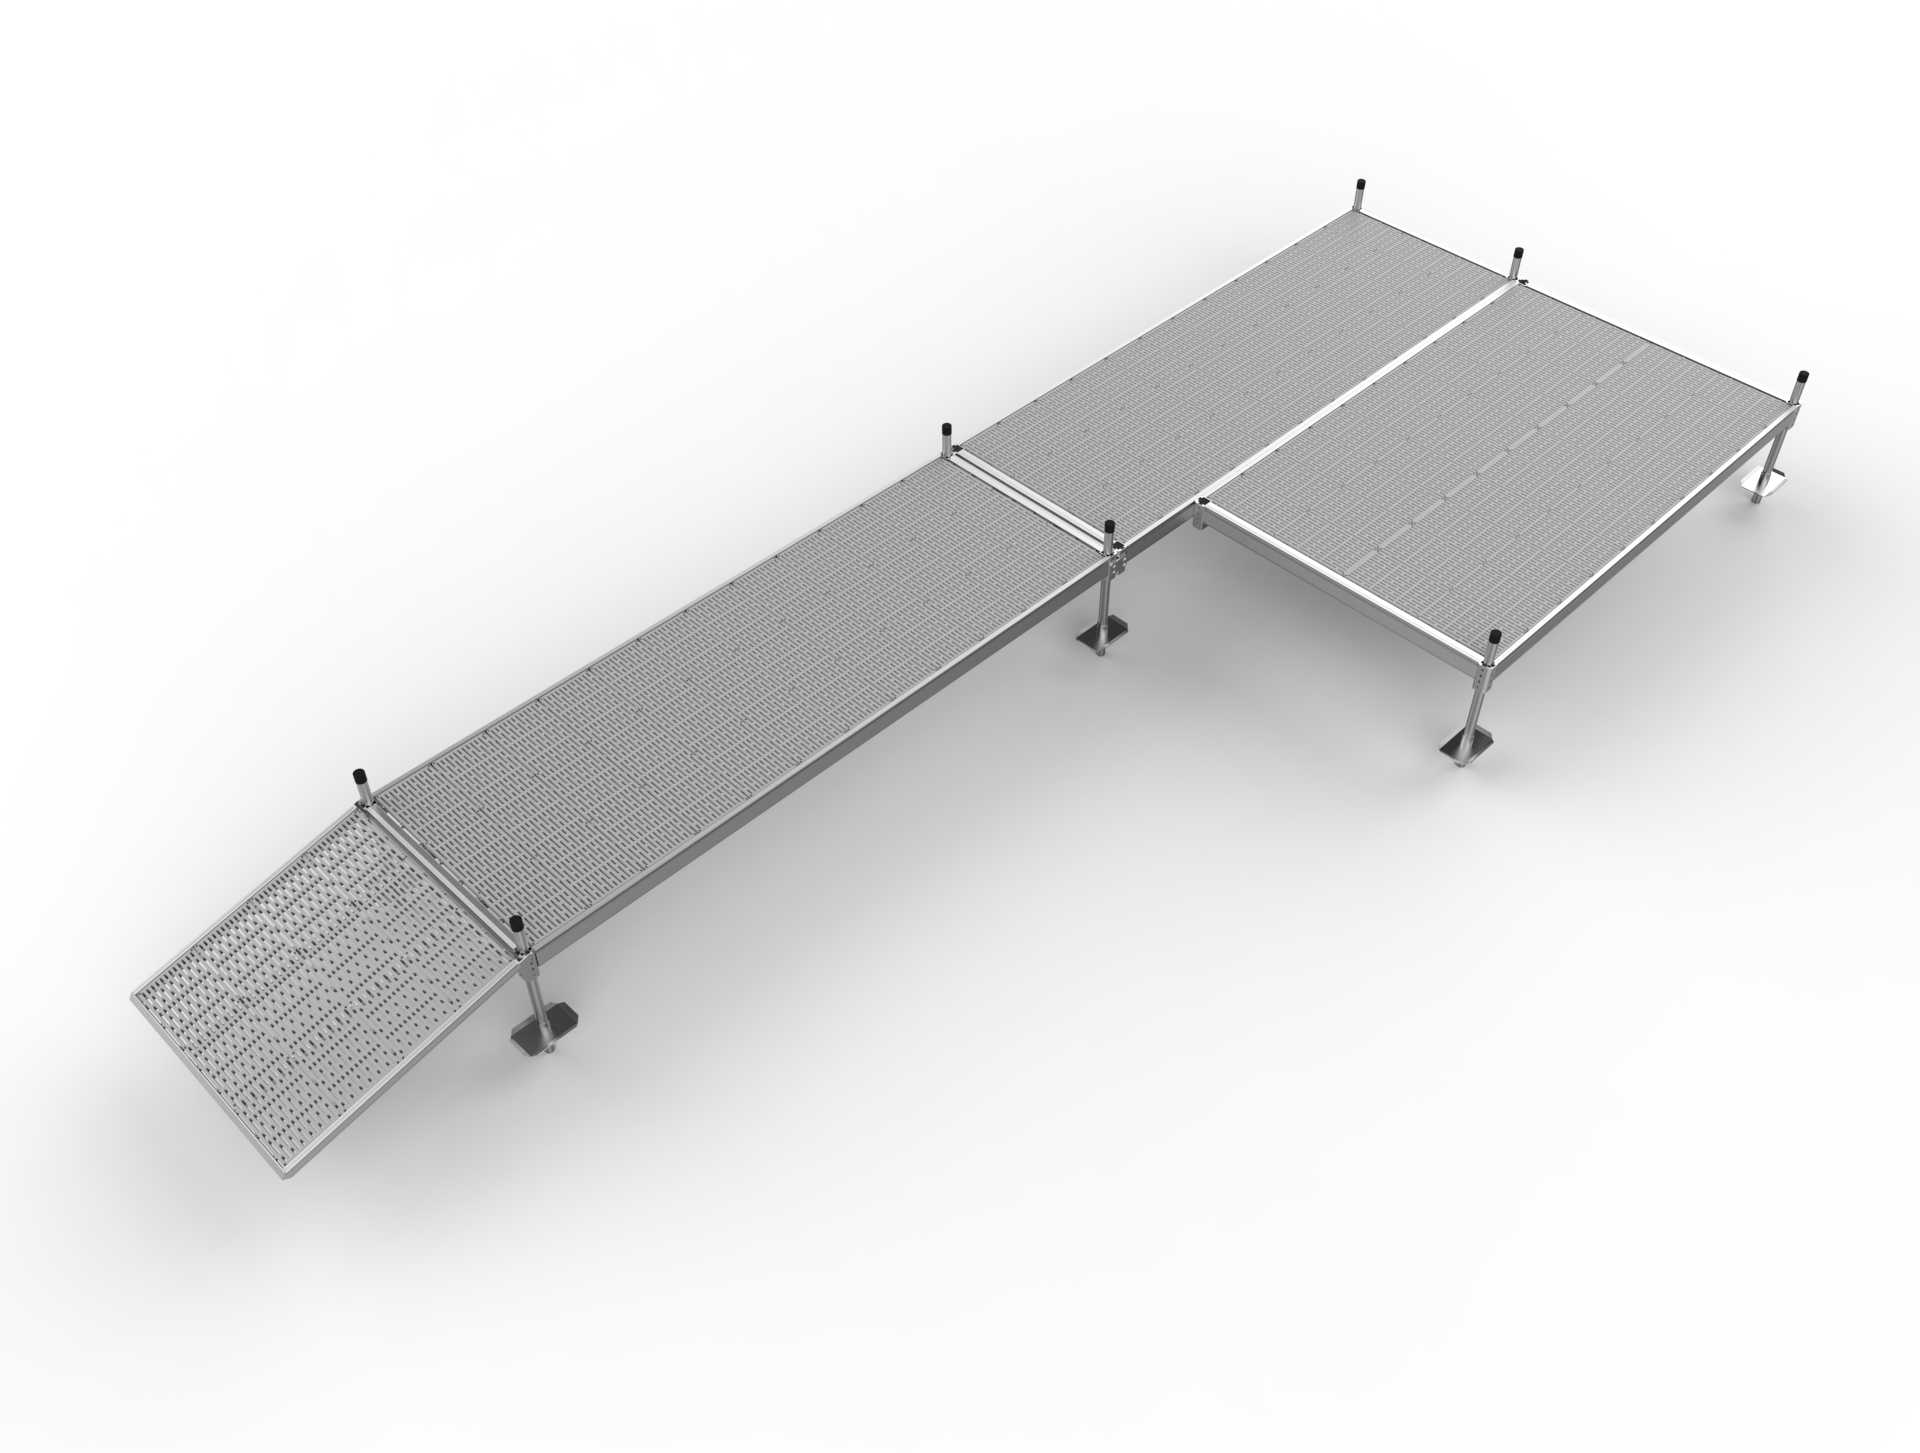 24 ft ramp, 6x10.1523